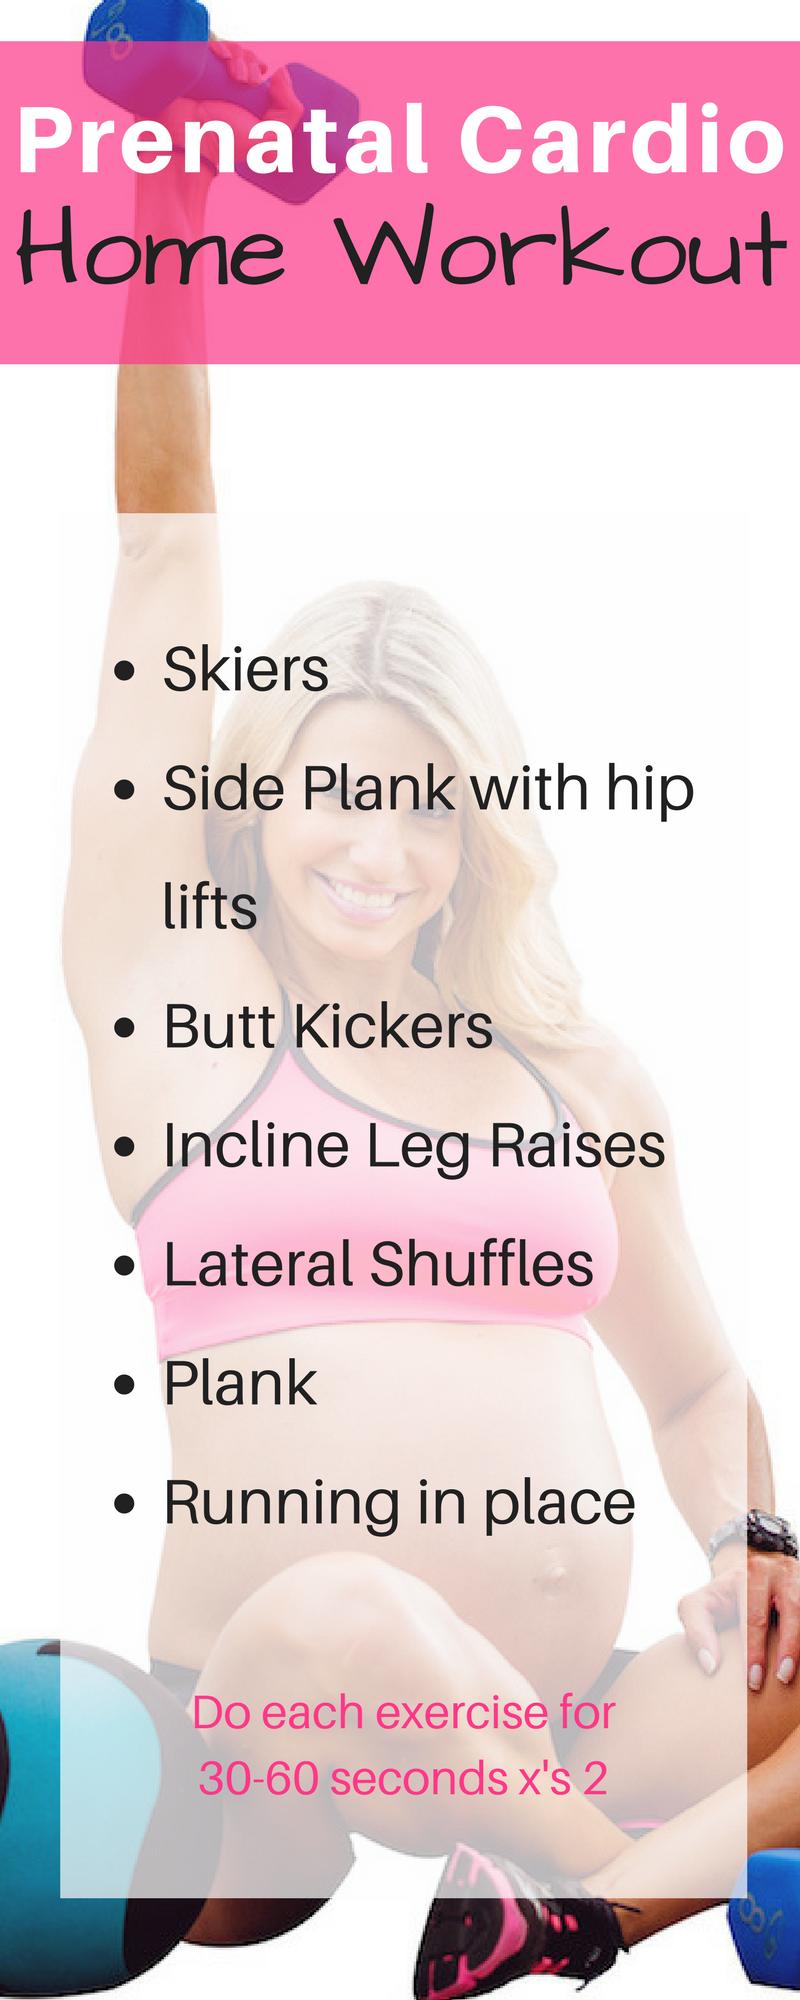 prenatal cardio home workout 1